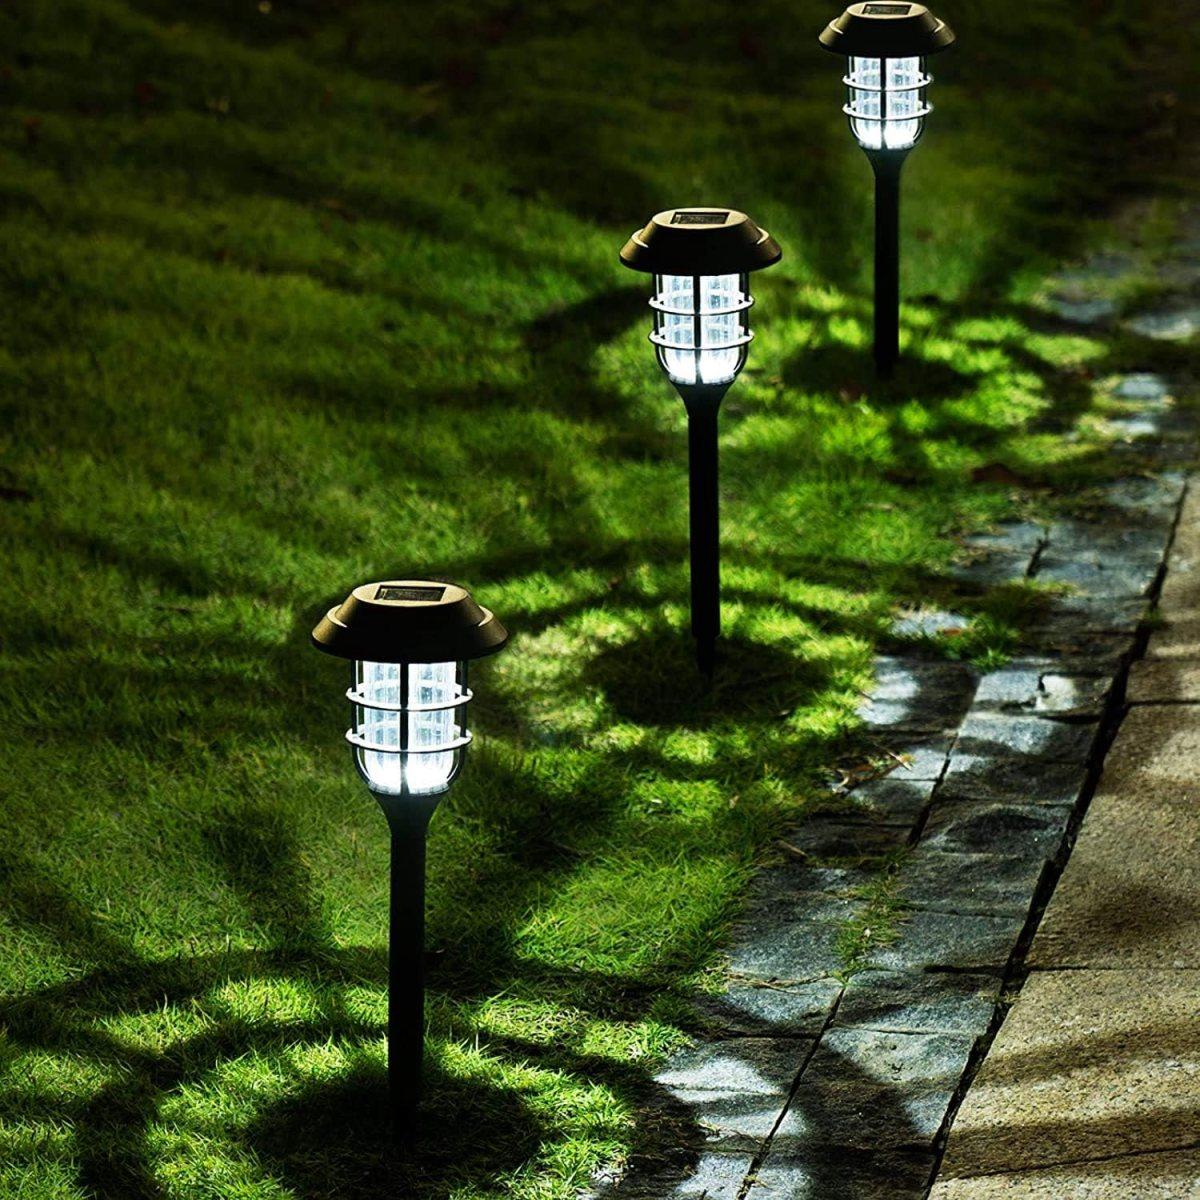 Solpex LED Path Lights